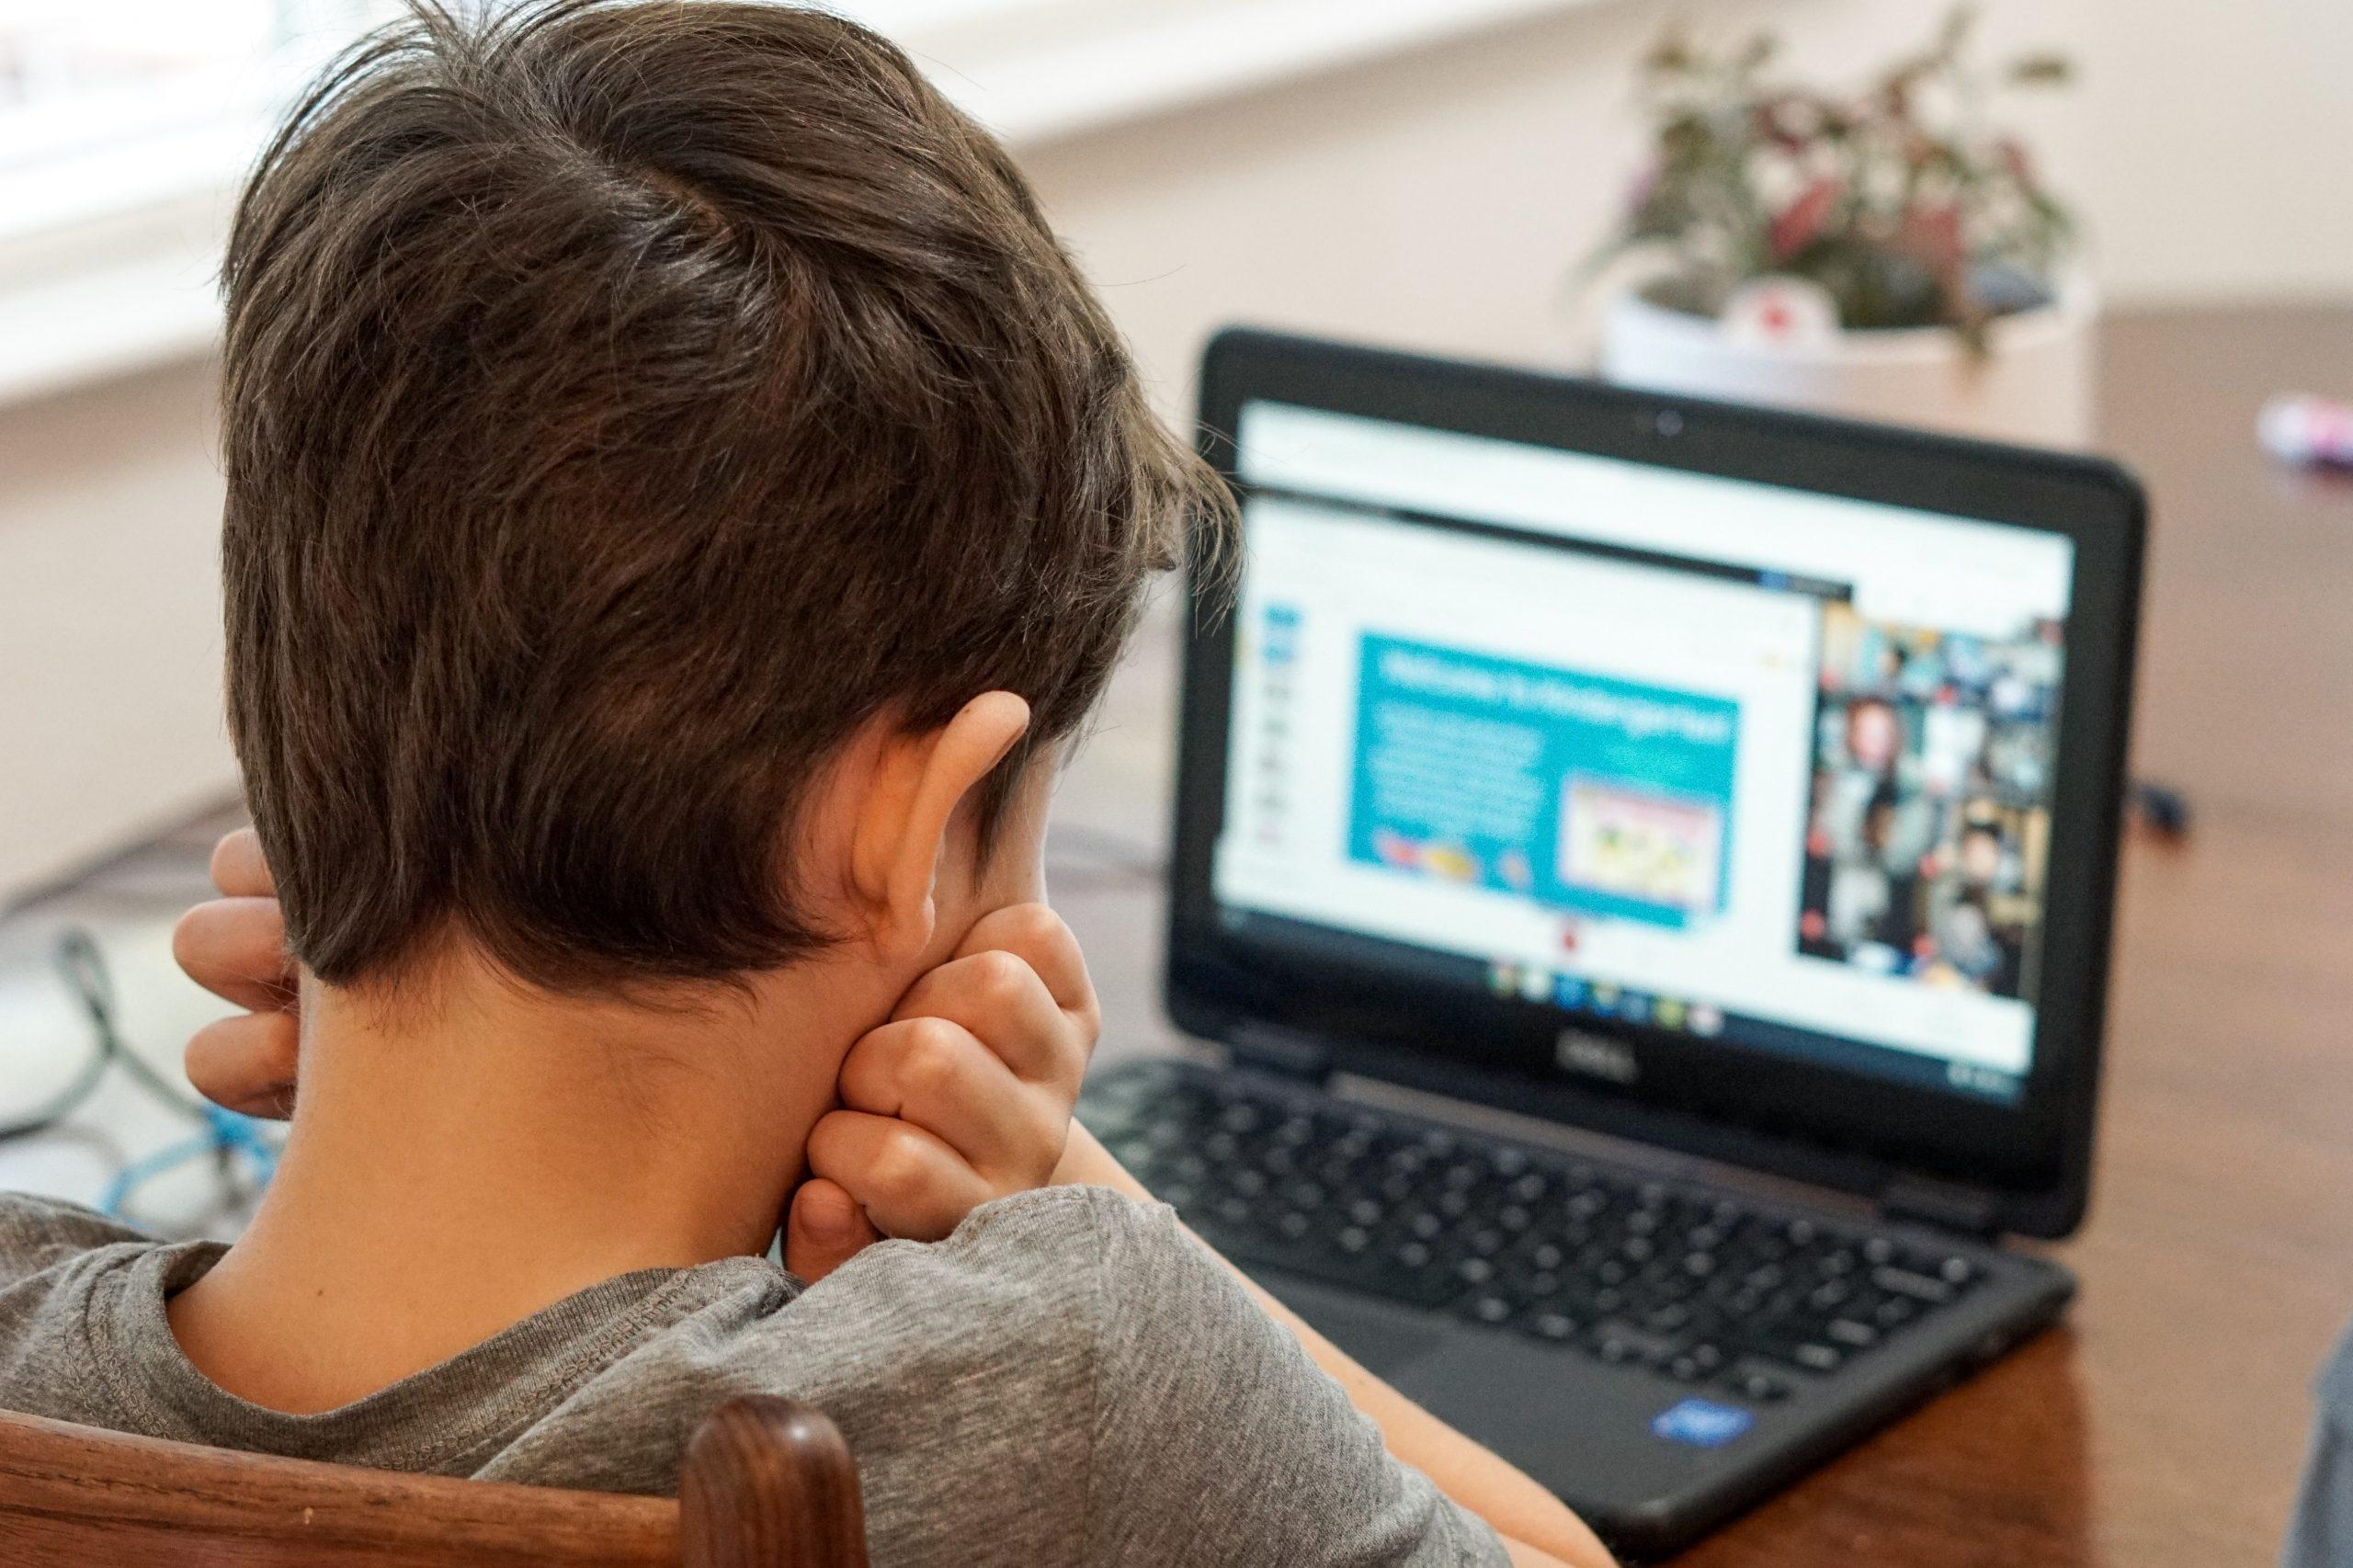 children and data privacy